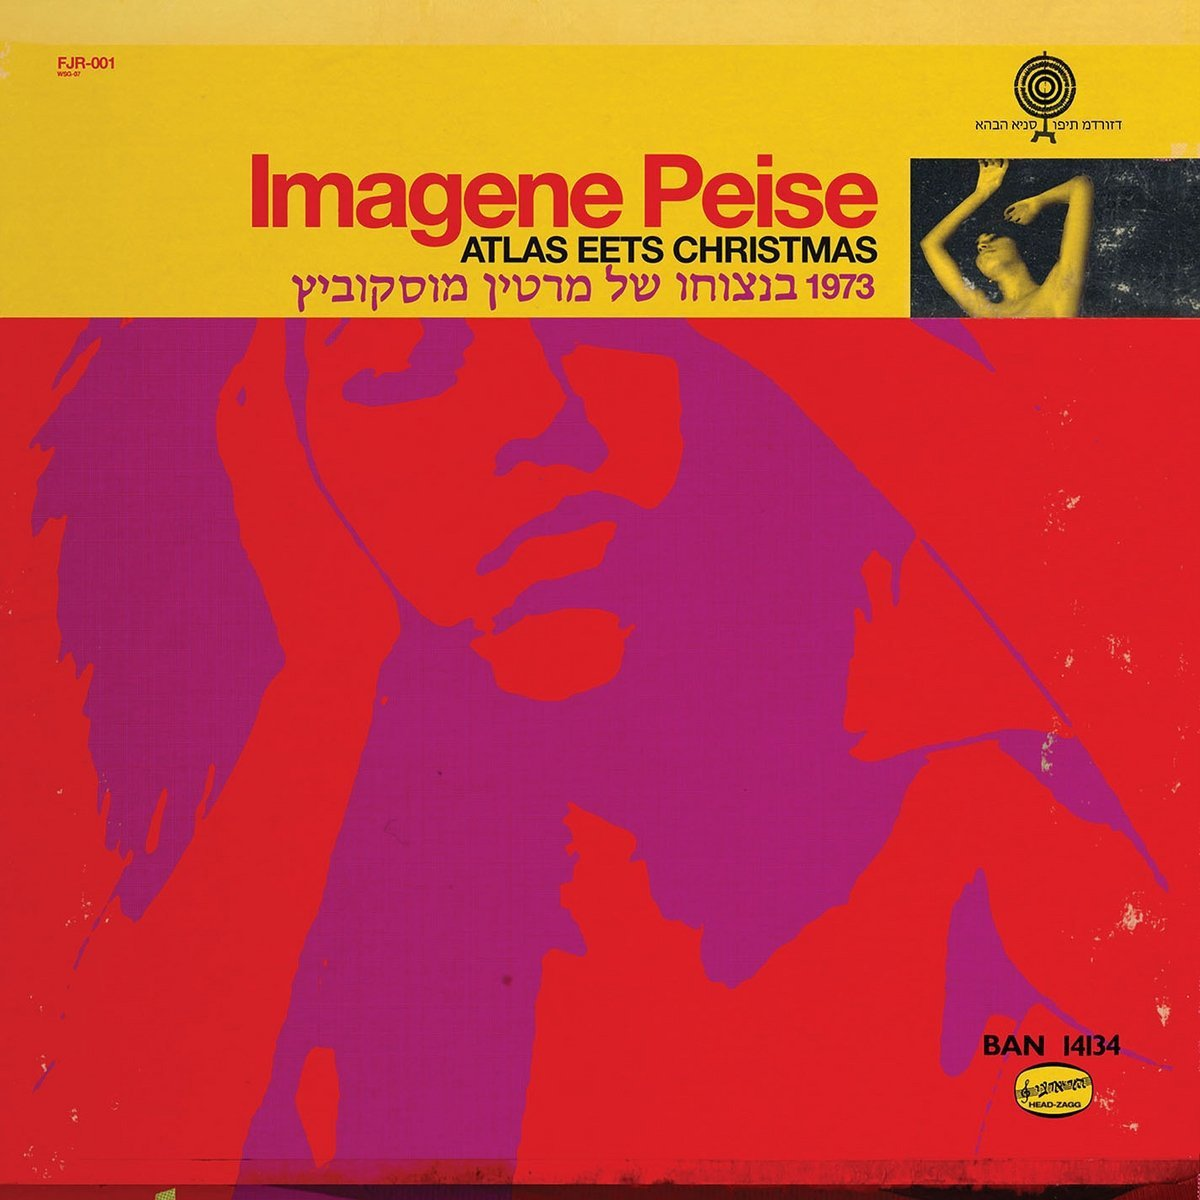 CD : The Flaming Lips - Imagene Peise - Atlas Eets Christmas (CD)